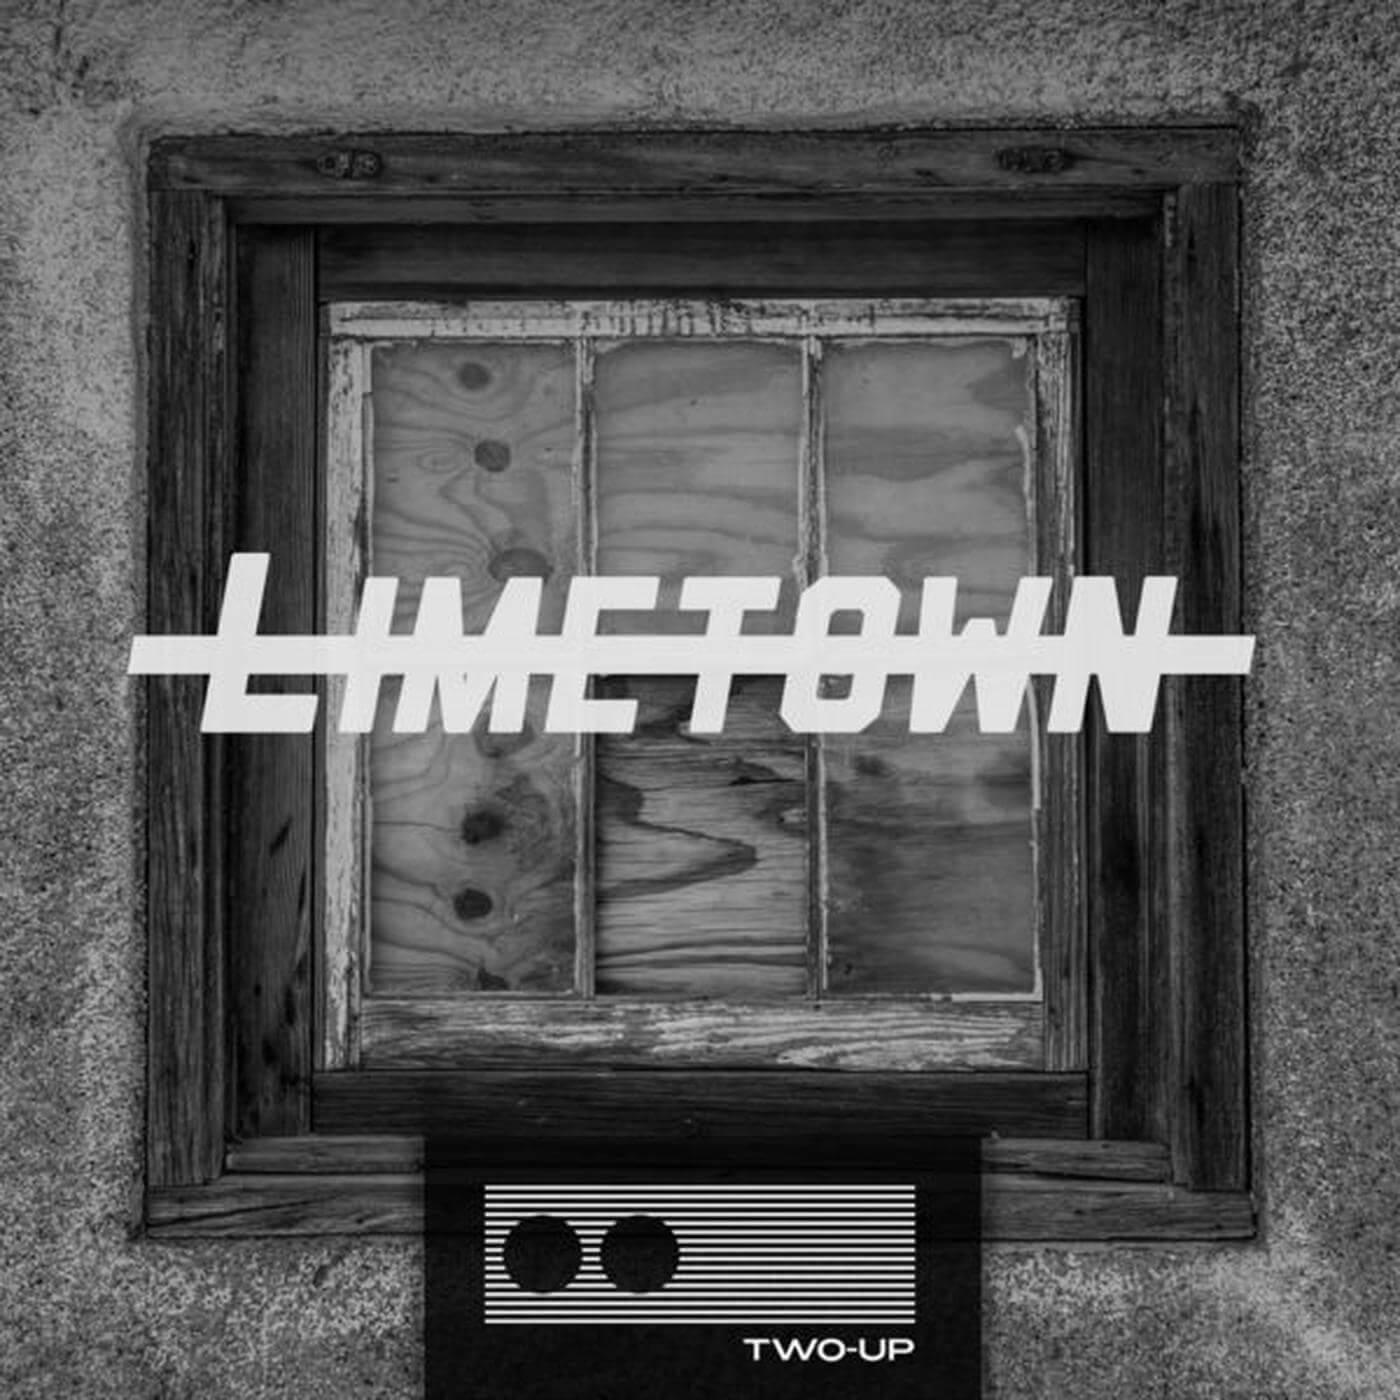 Limetown.jpg